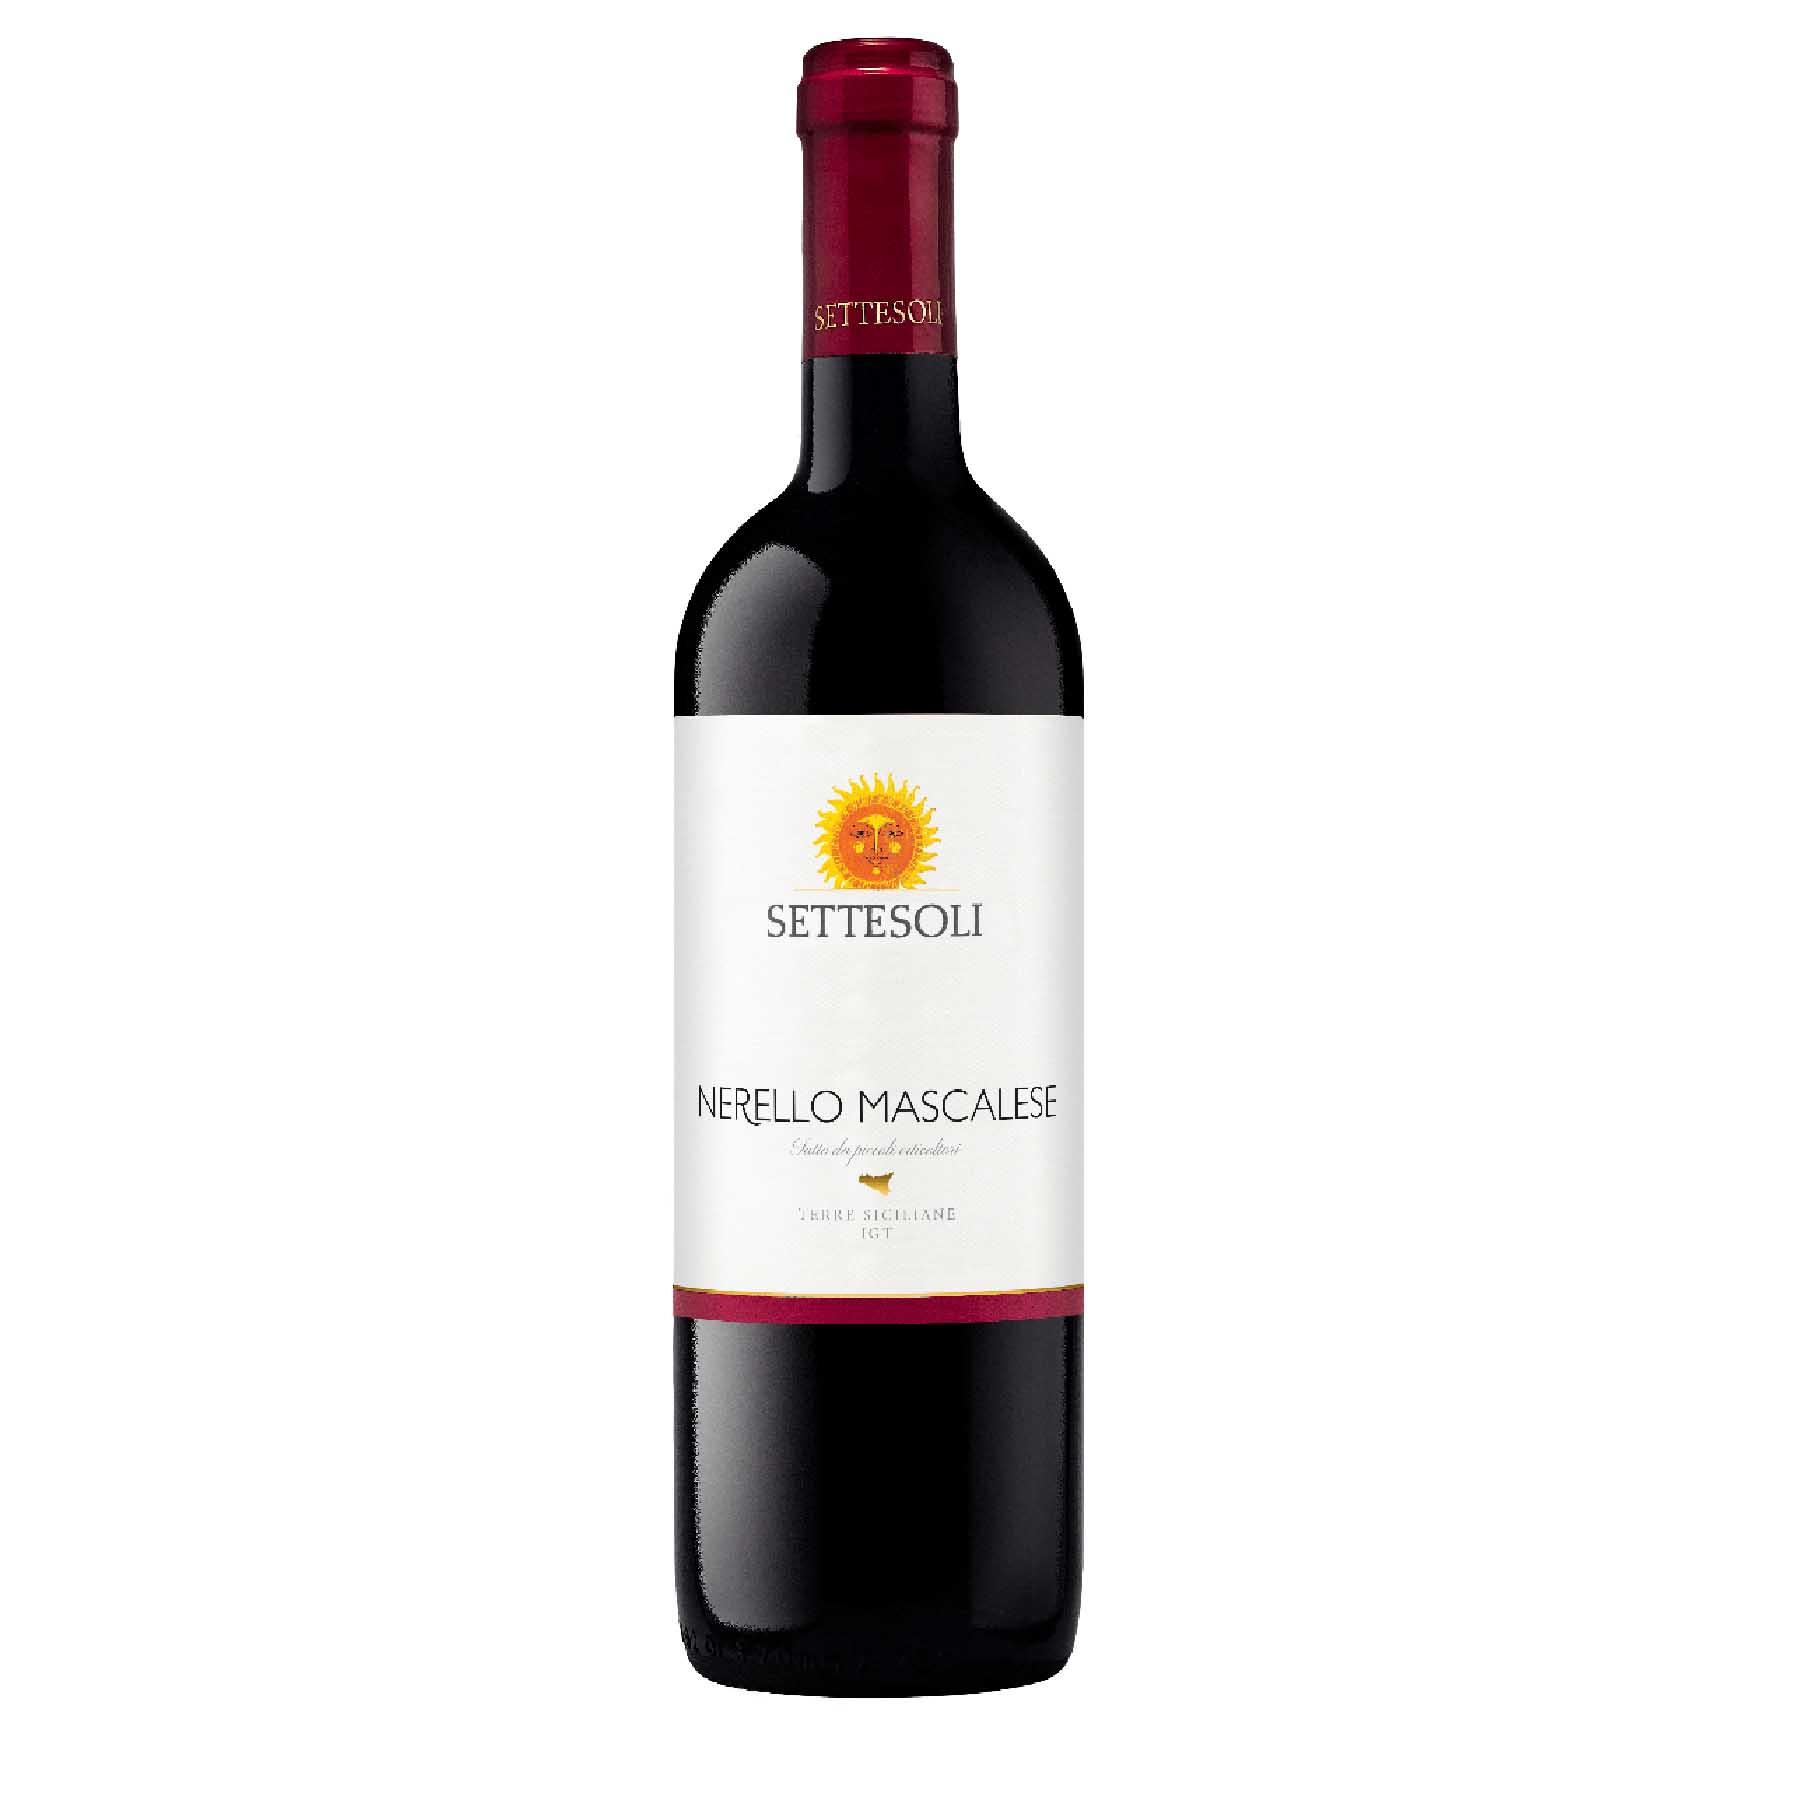 Vinho Tinto Italiano Settesoli Nerello Mascalese 2019